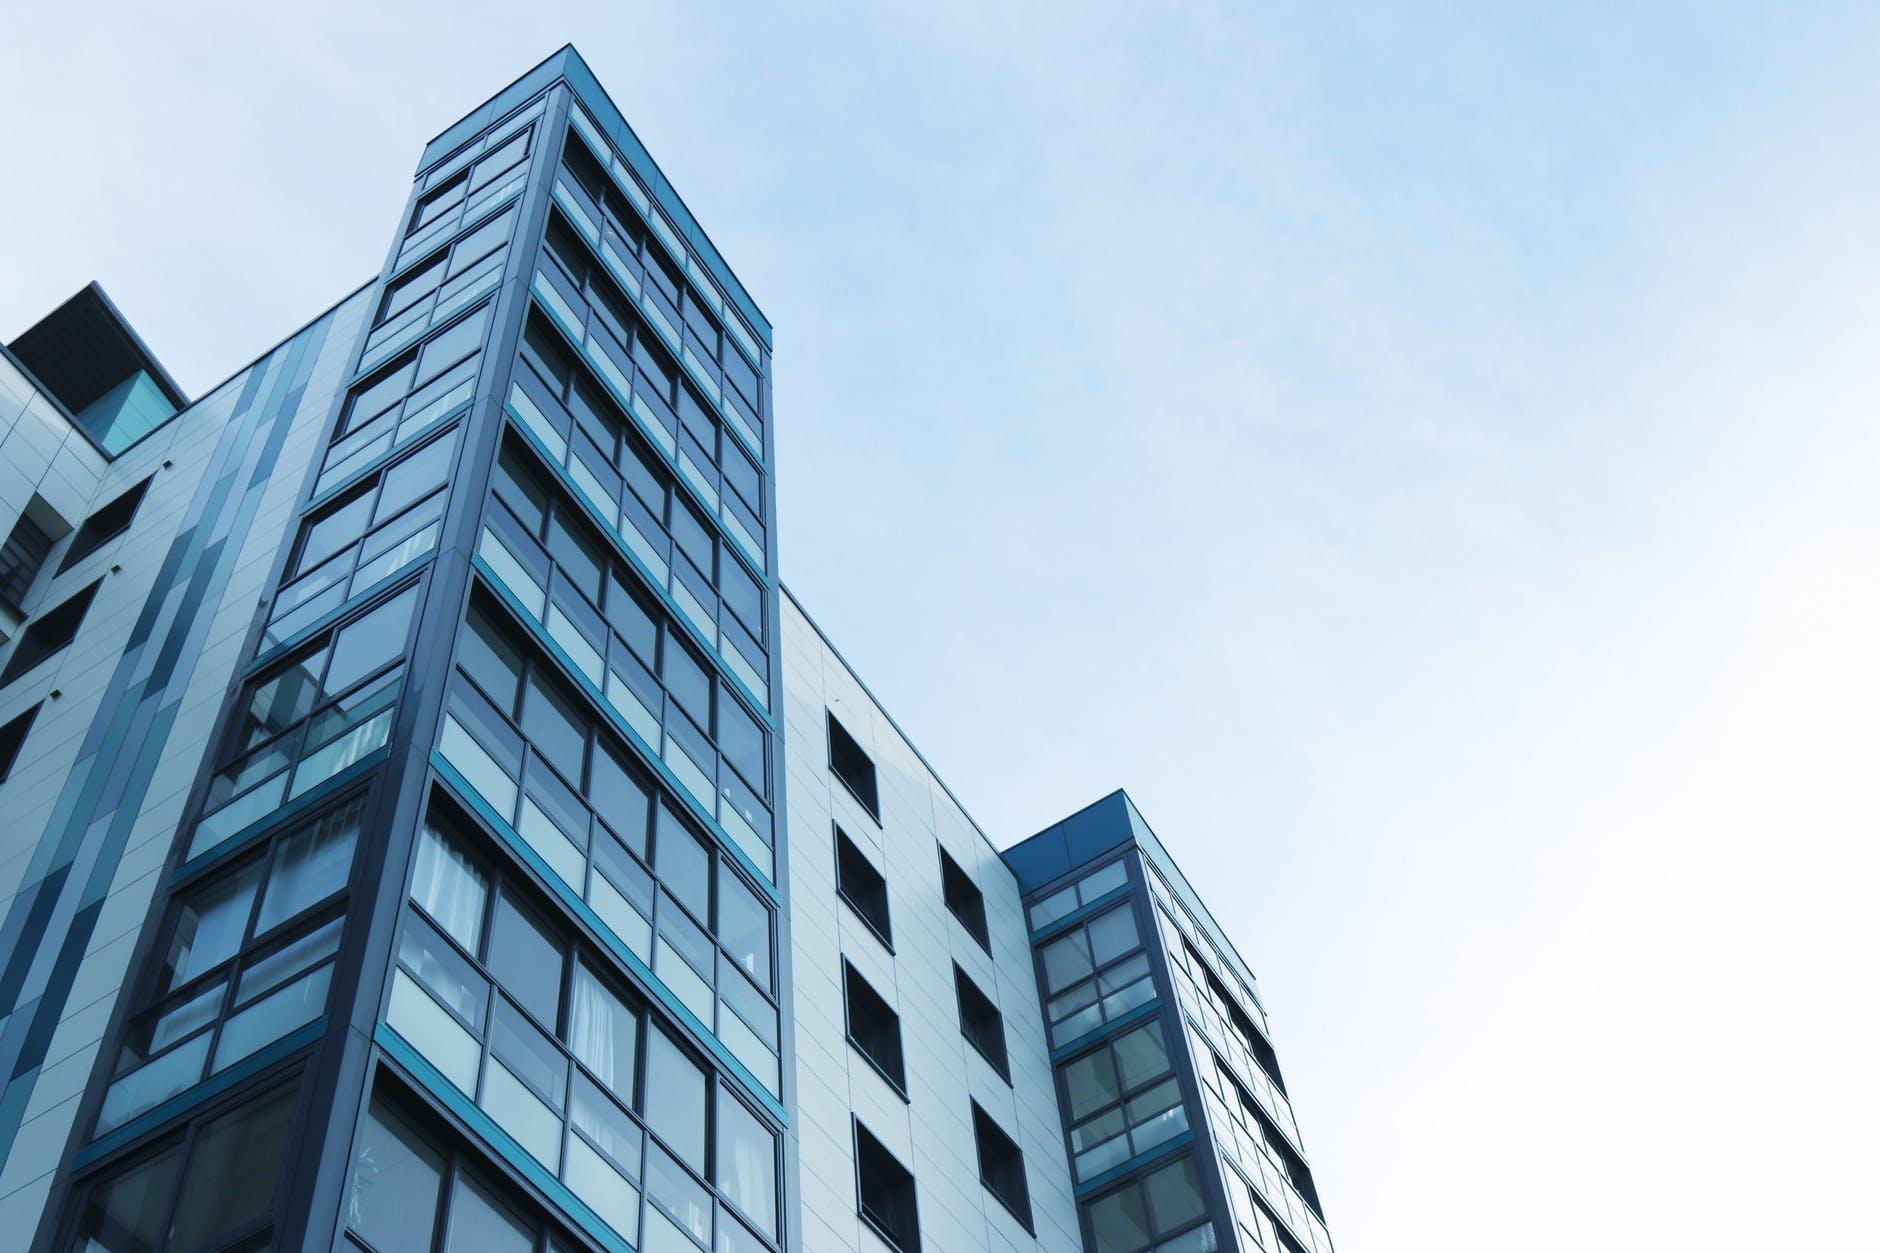 apartment apartment building architecture building